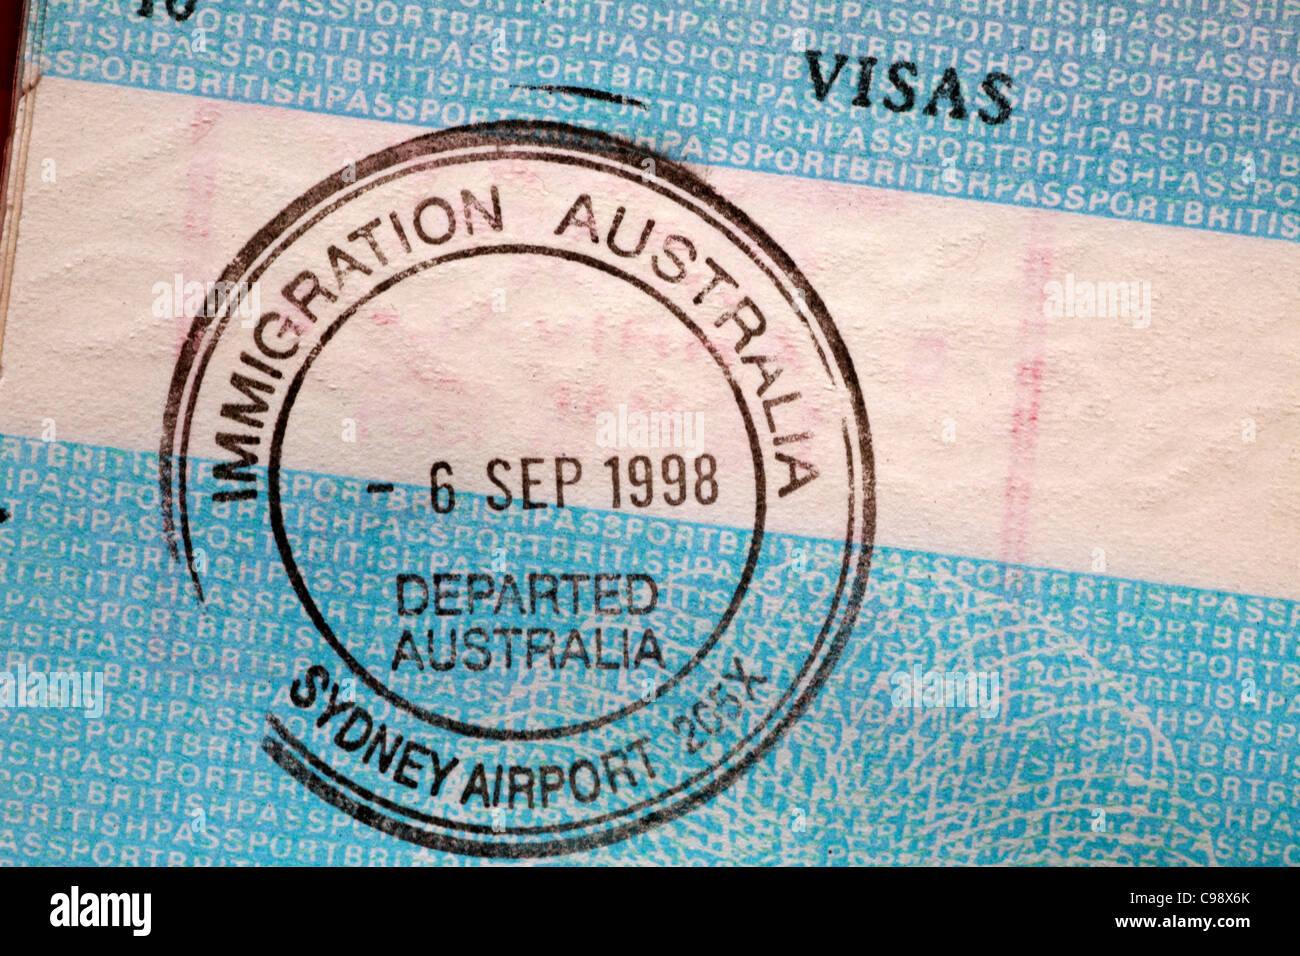 Immigration Australia Sydney Airport stamp in British passport Stock Photo